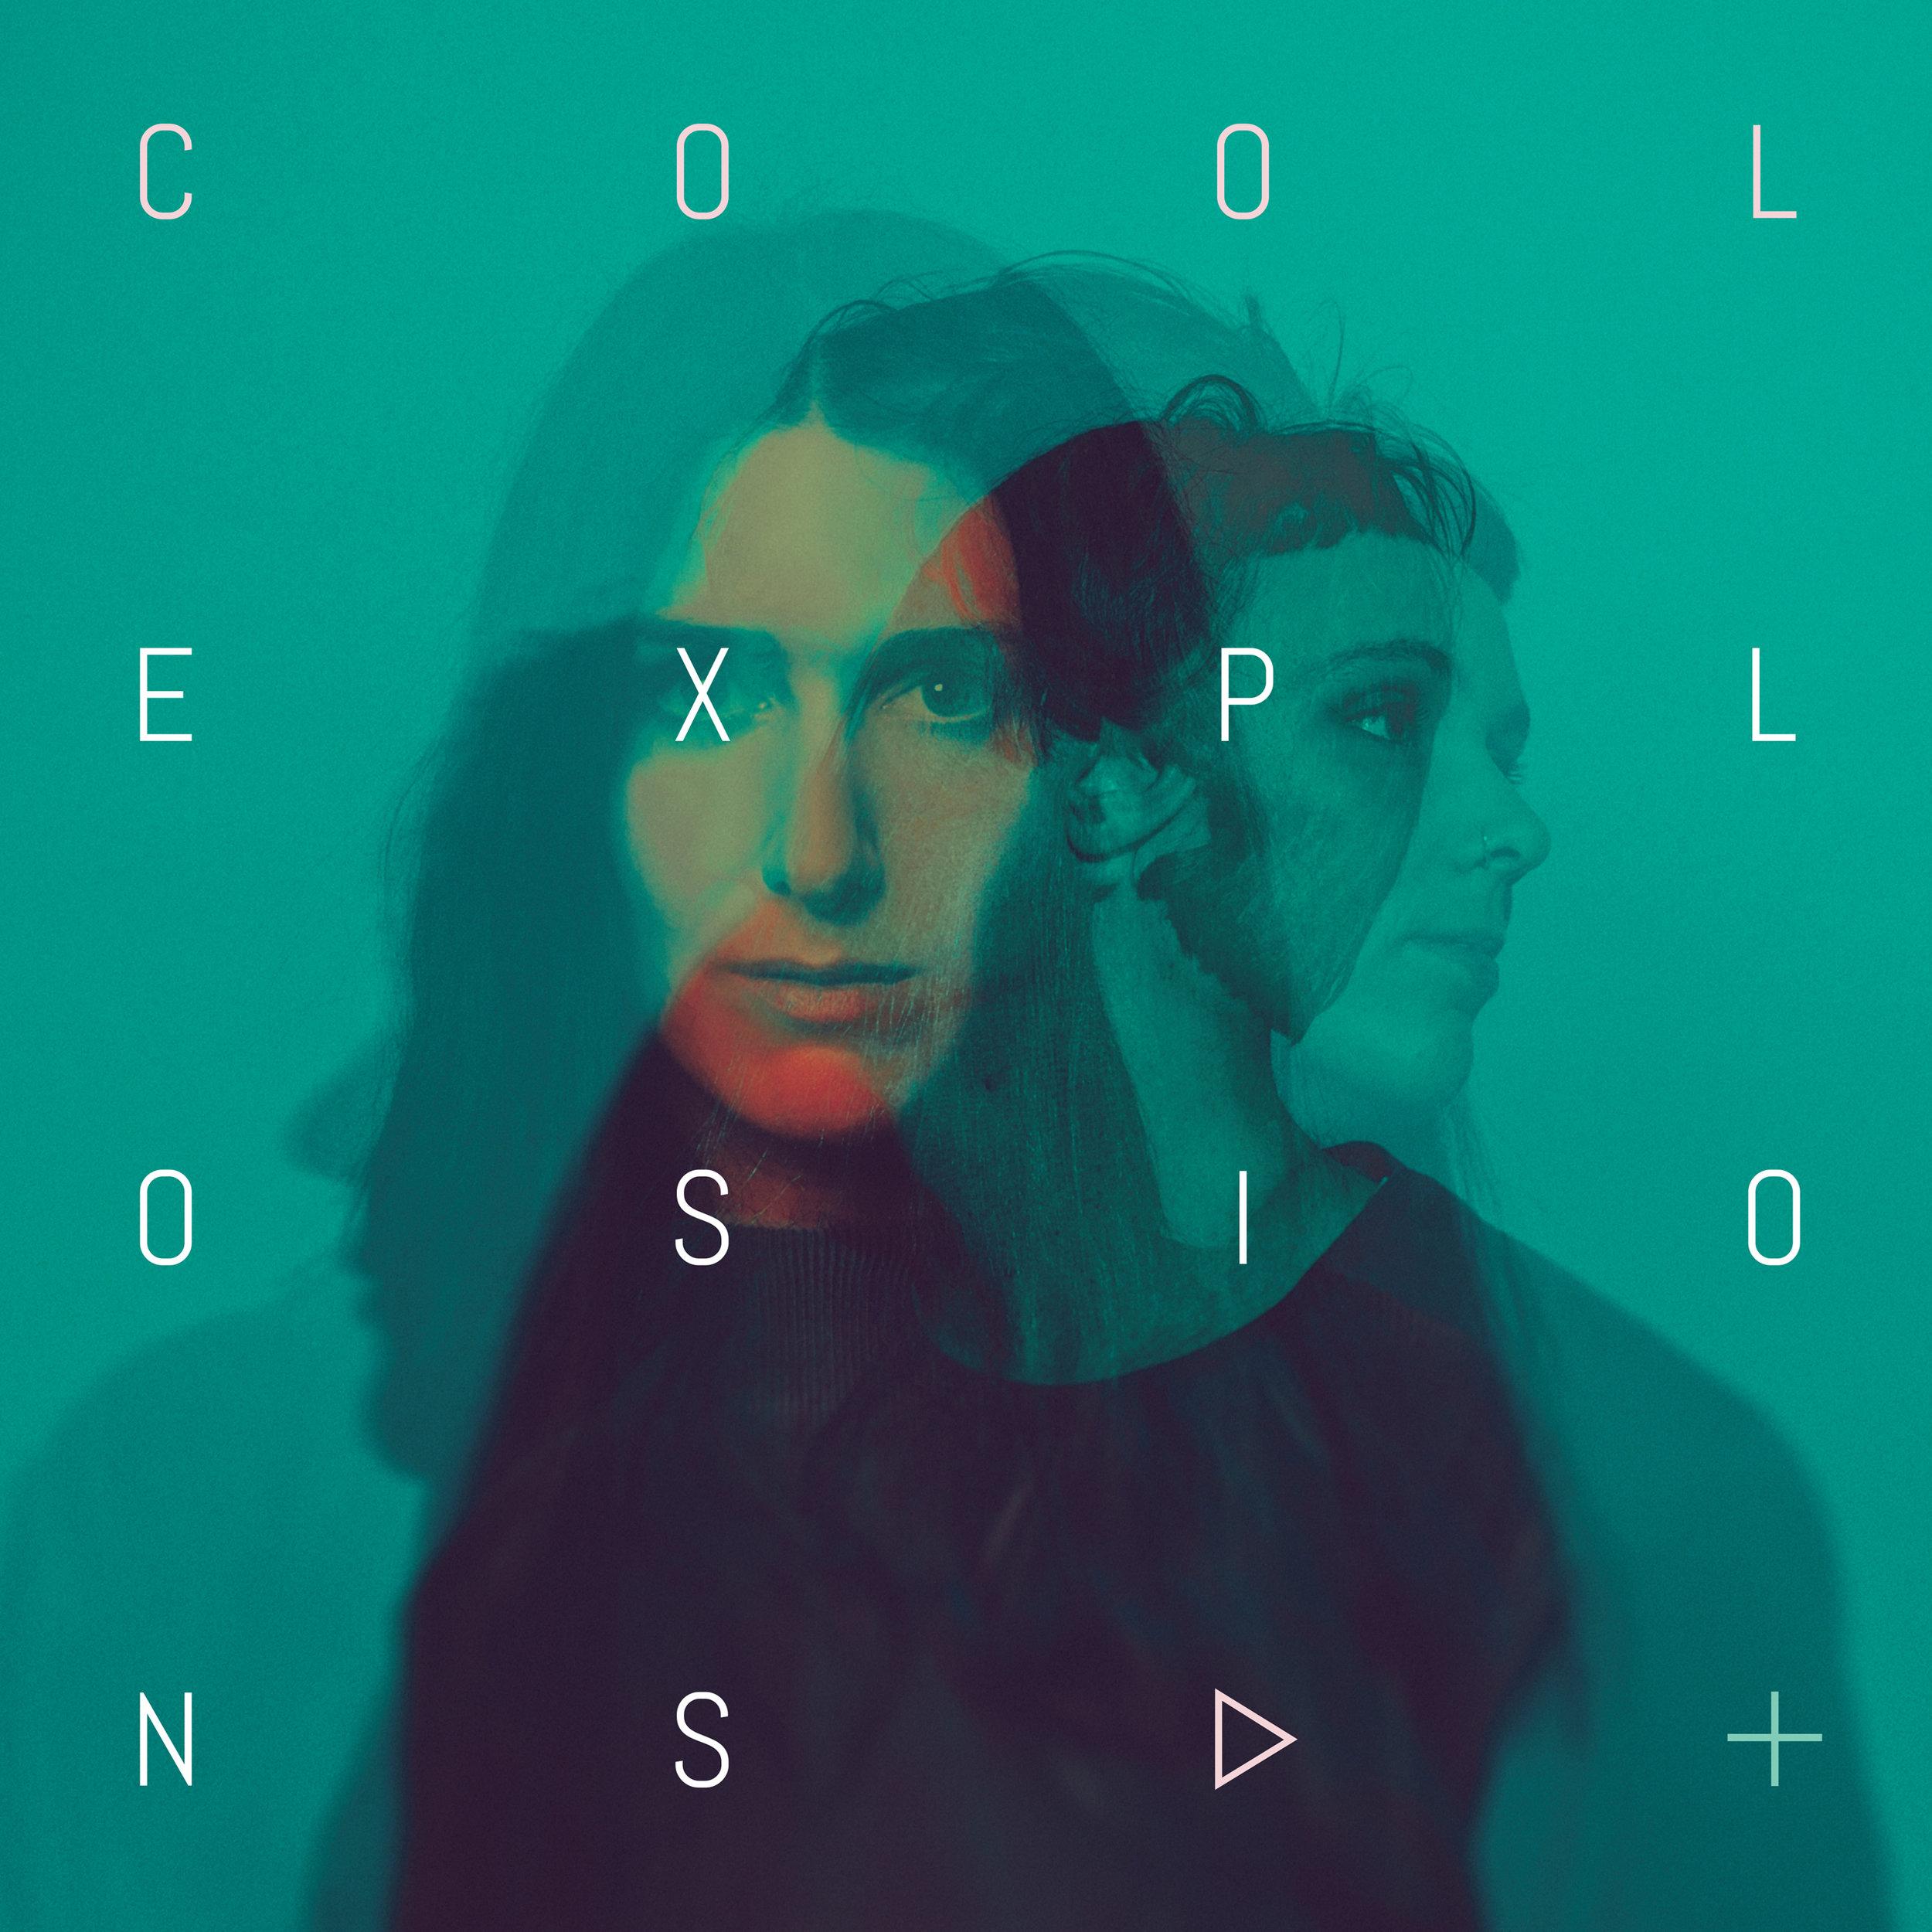 Cool Explosions Debut Album sleeve art